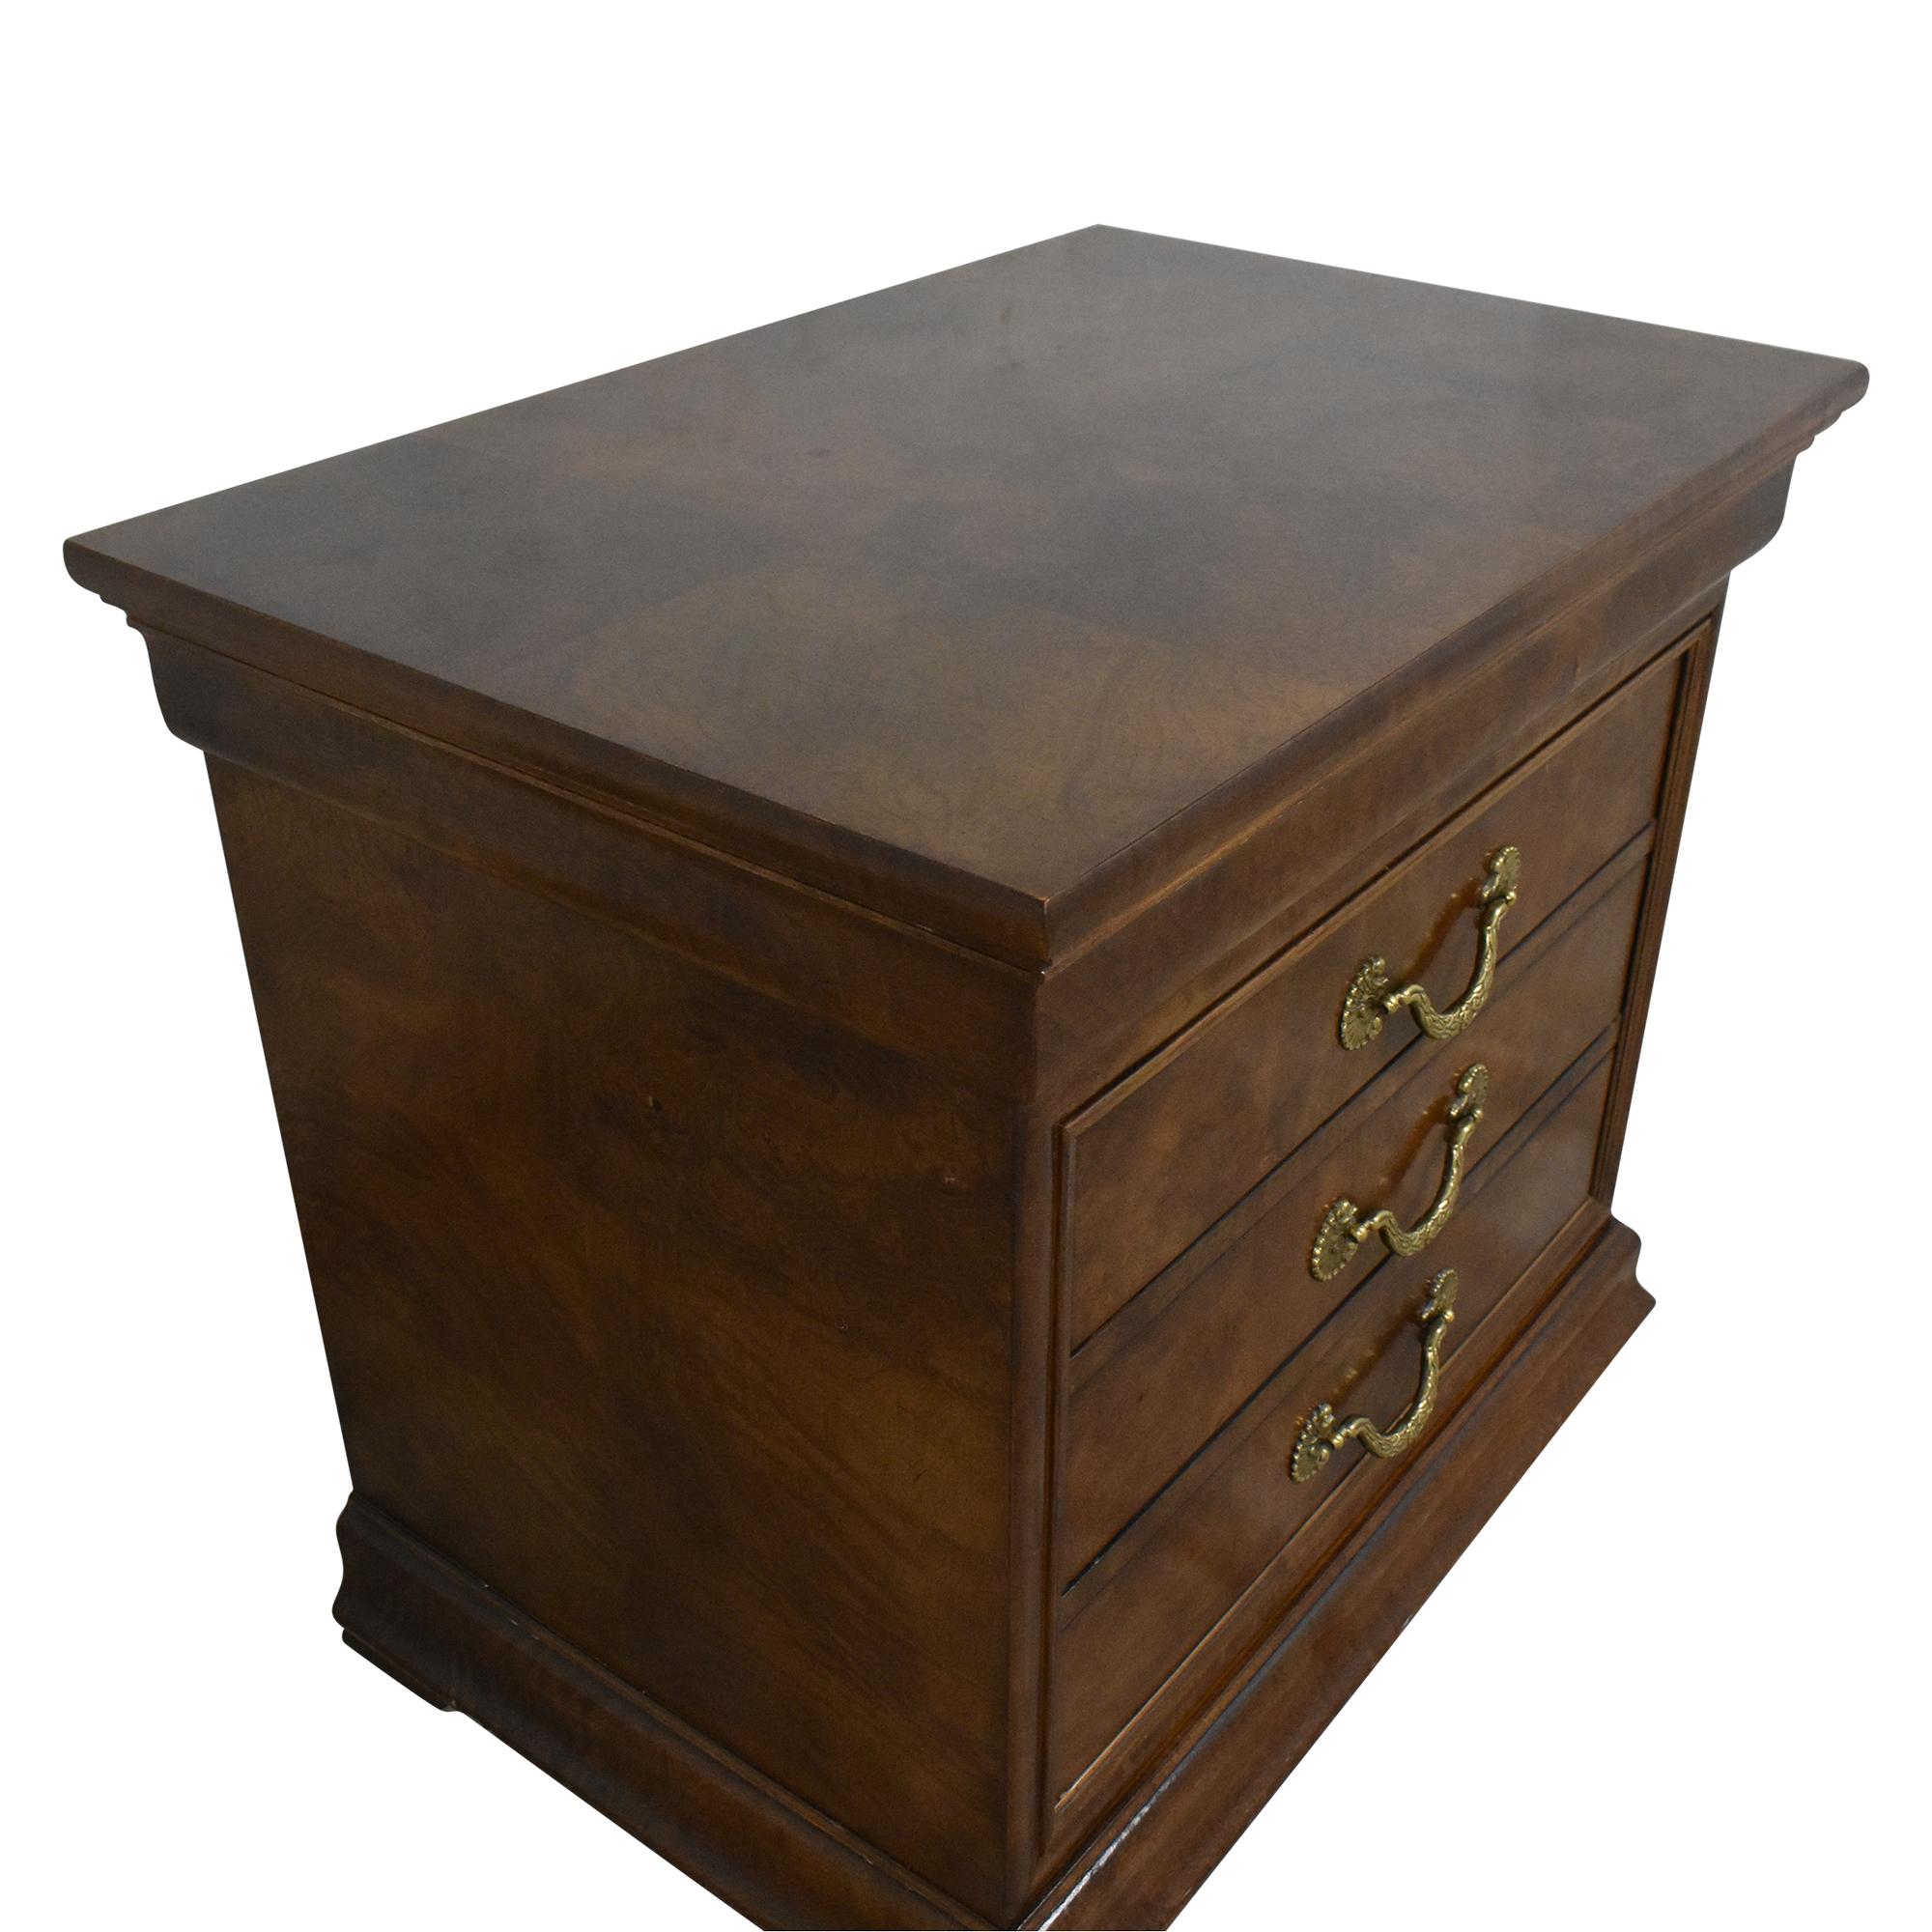 Henredon Furniture Henredon Furniture Charles X Collection Nightstand for sale